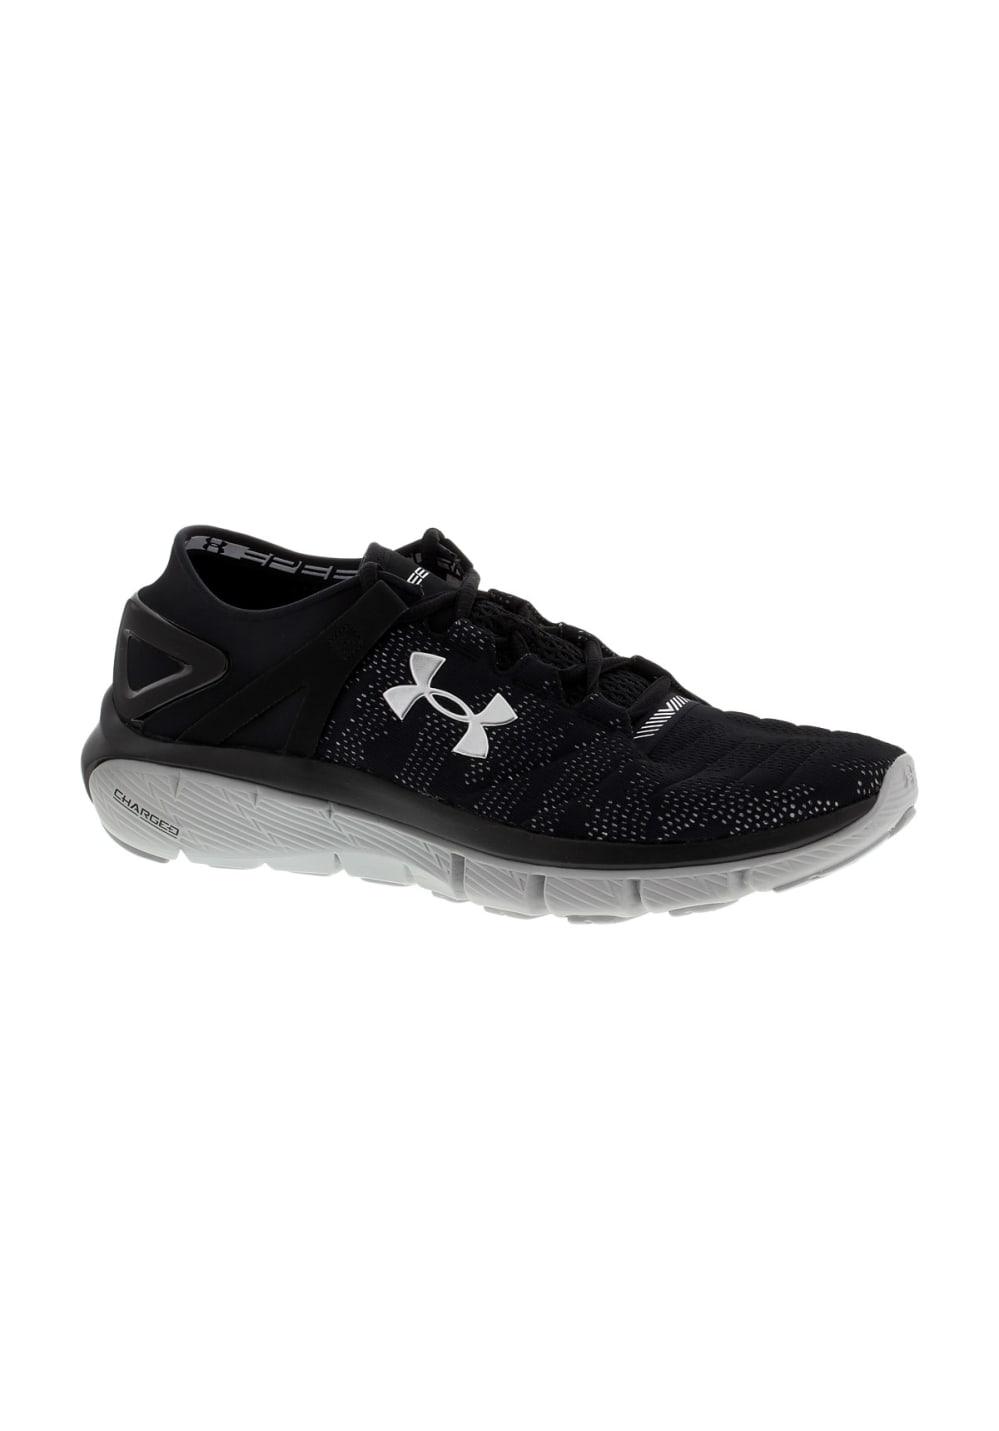 prachtige stijl lage kosten nieuwe authentiek Under Armour Speedform Fortis Vent - Running shoes for Men - Black